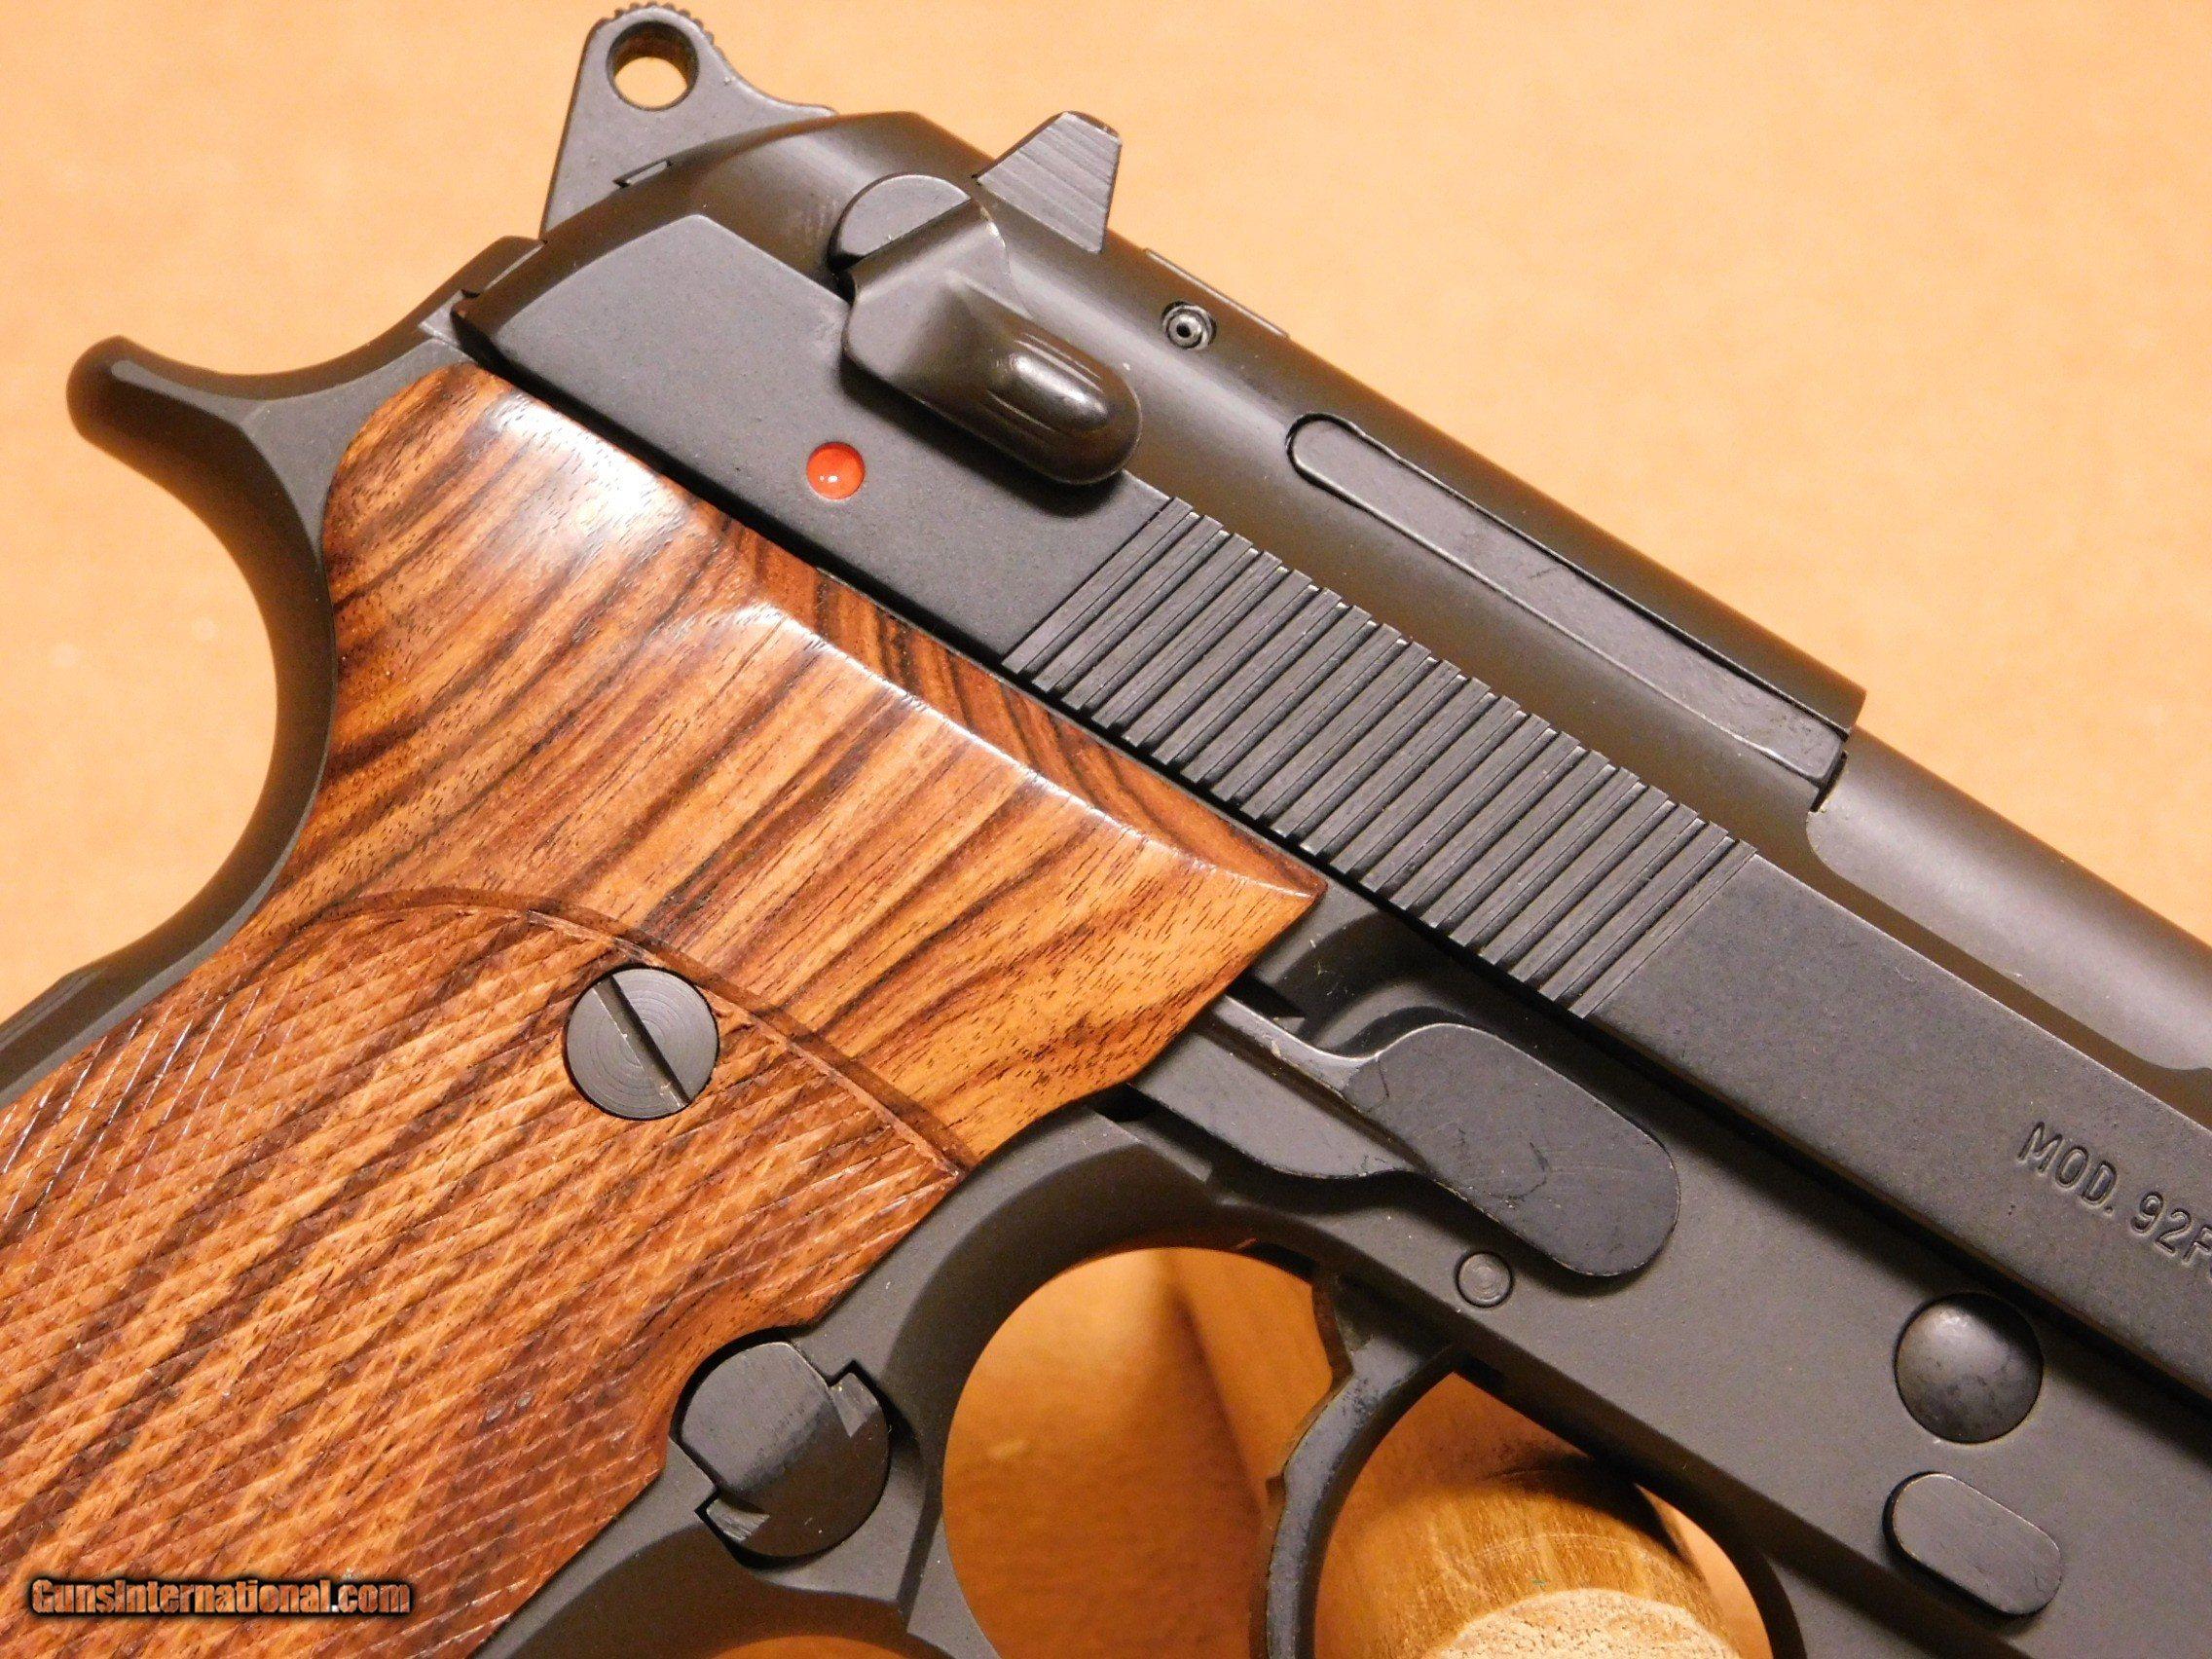 Beretta 92FS (Black, Hogue Kingwood Grips) 92 FS for sale